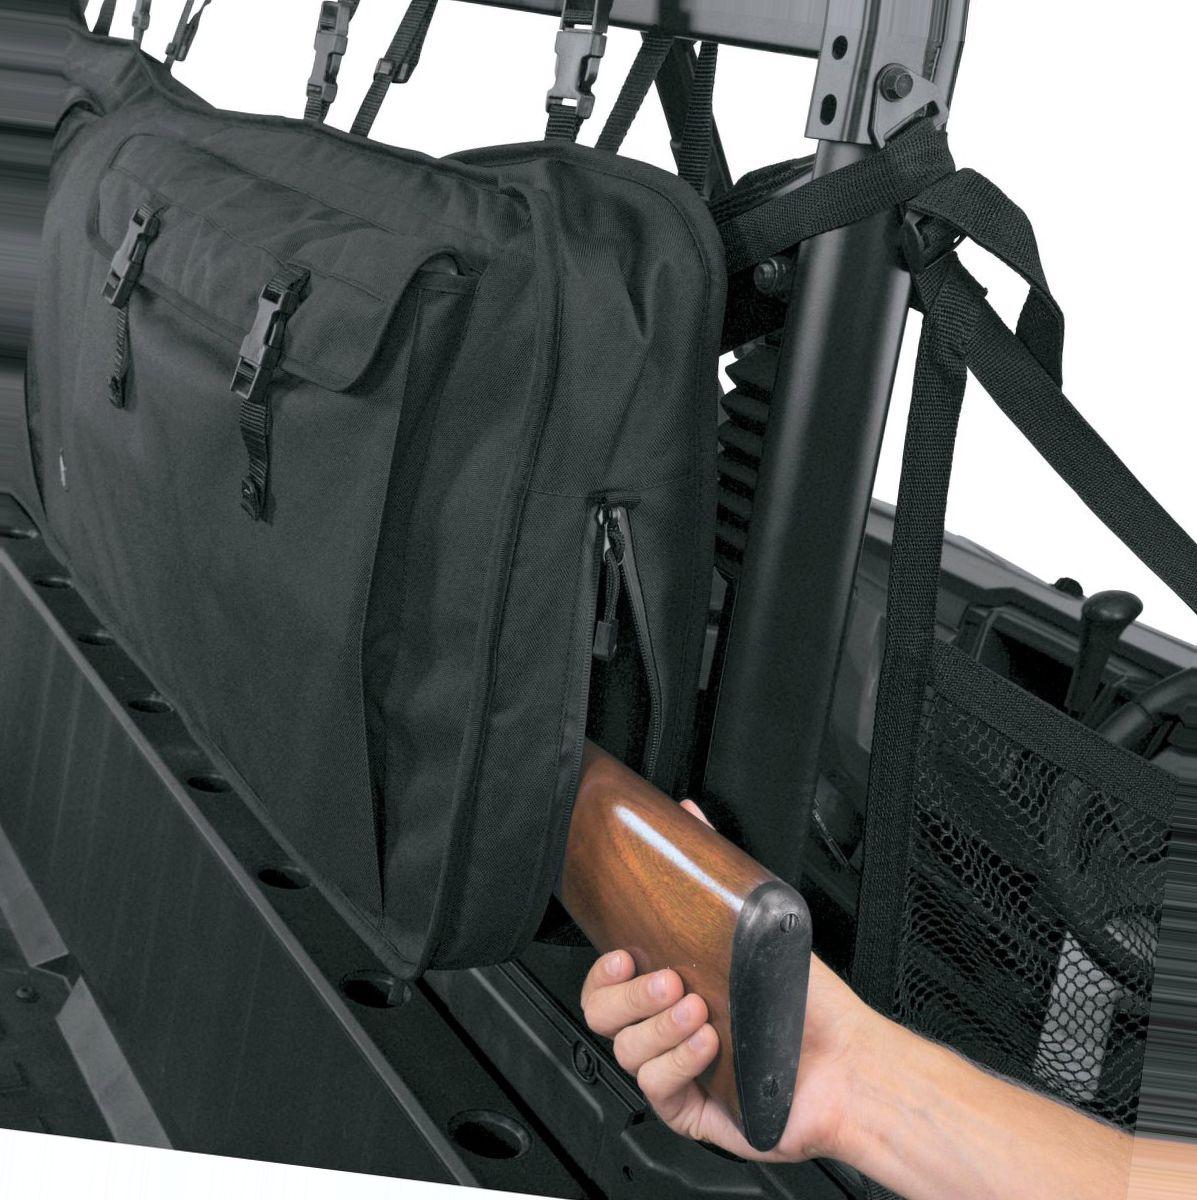 Classic Accessories™ UTV Double-Gun Carrier